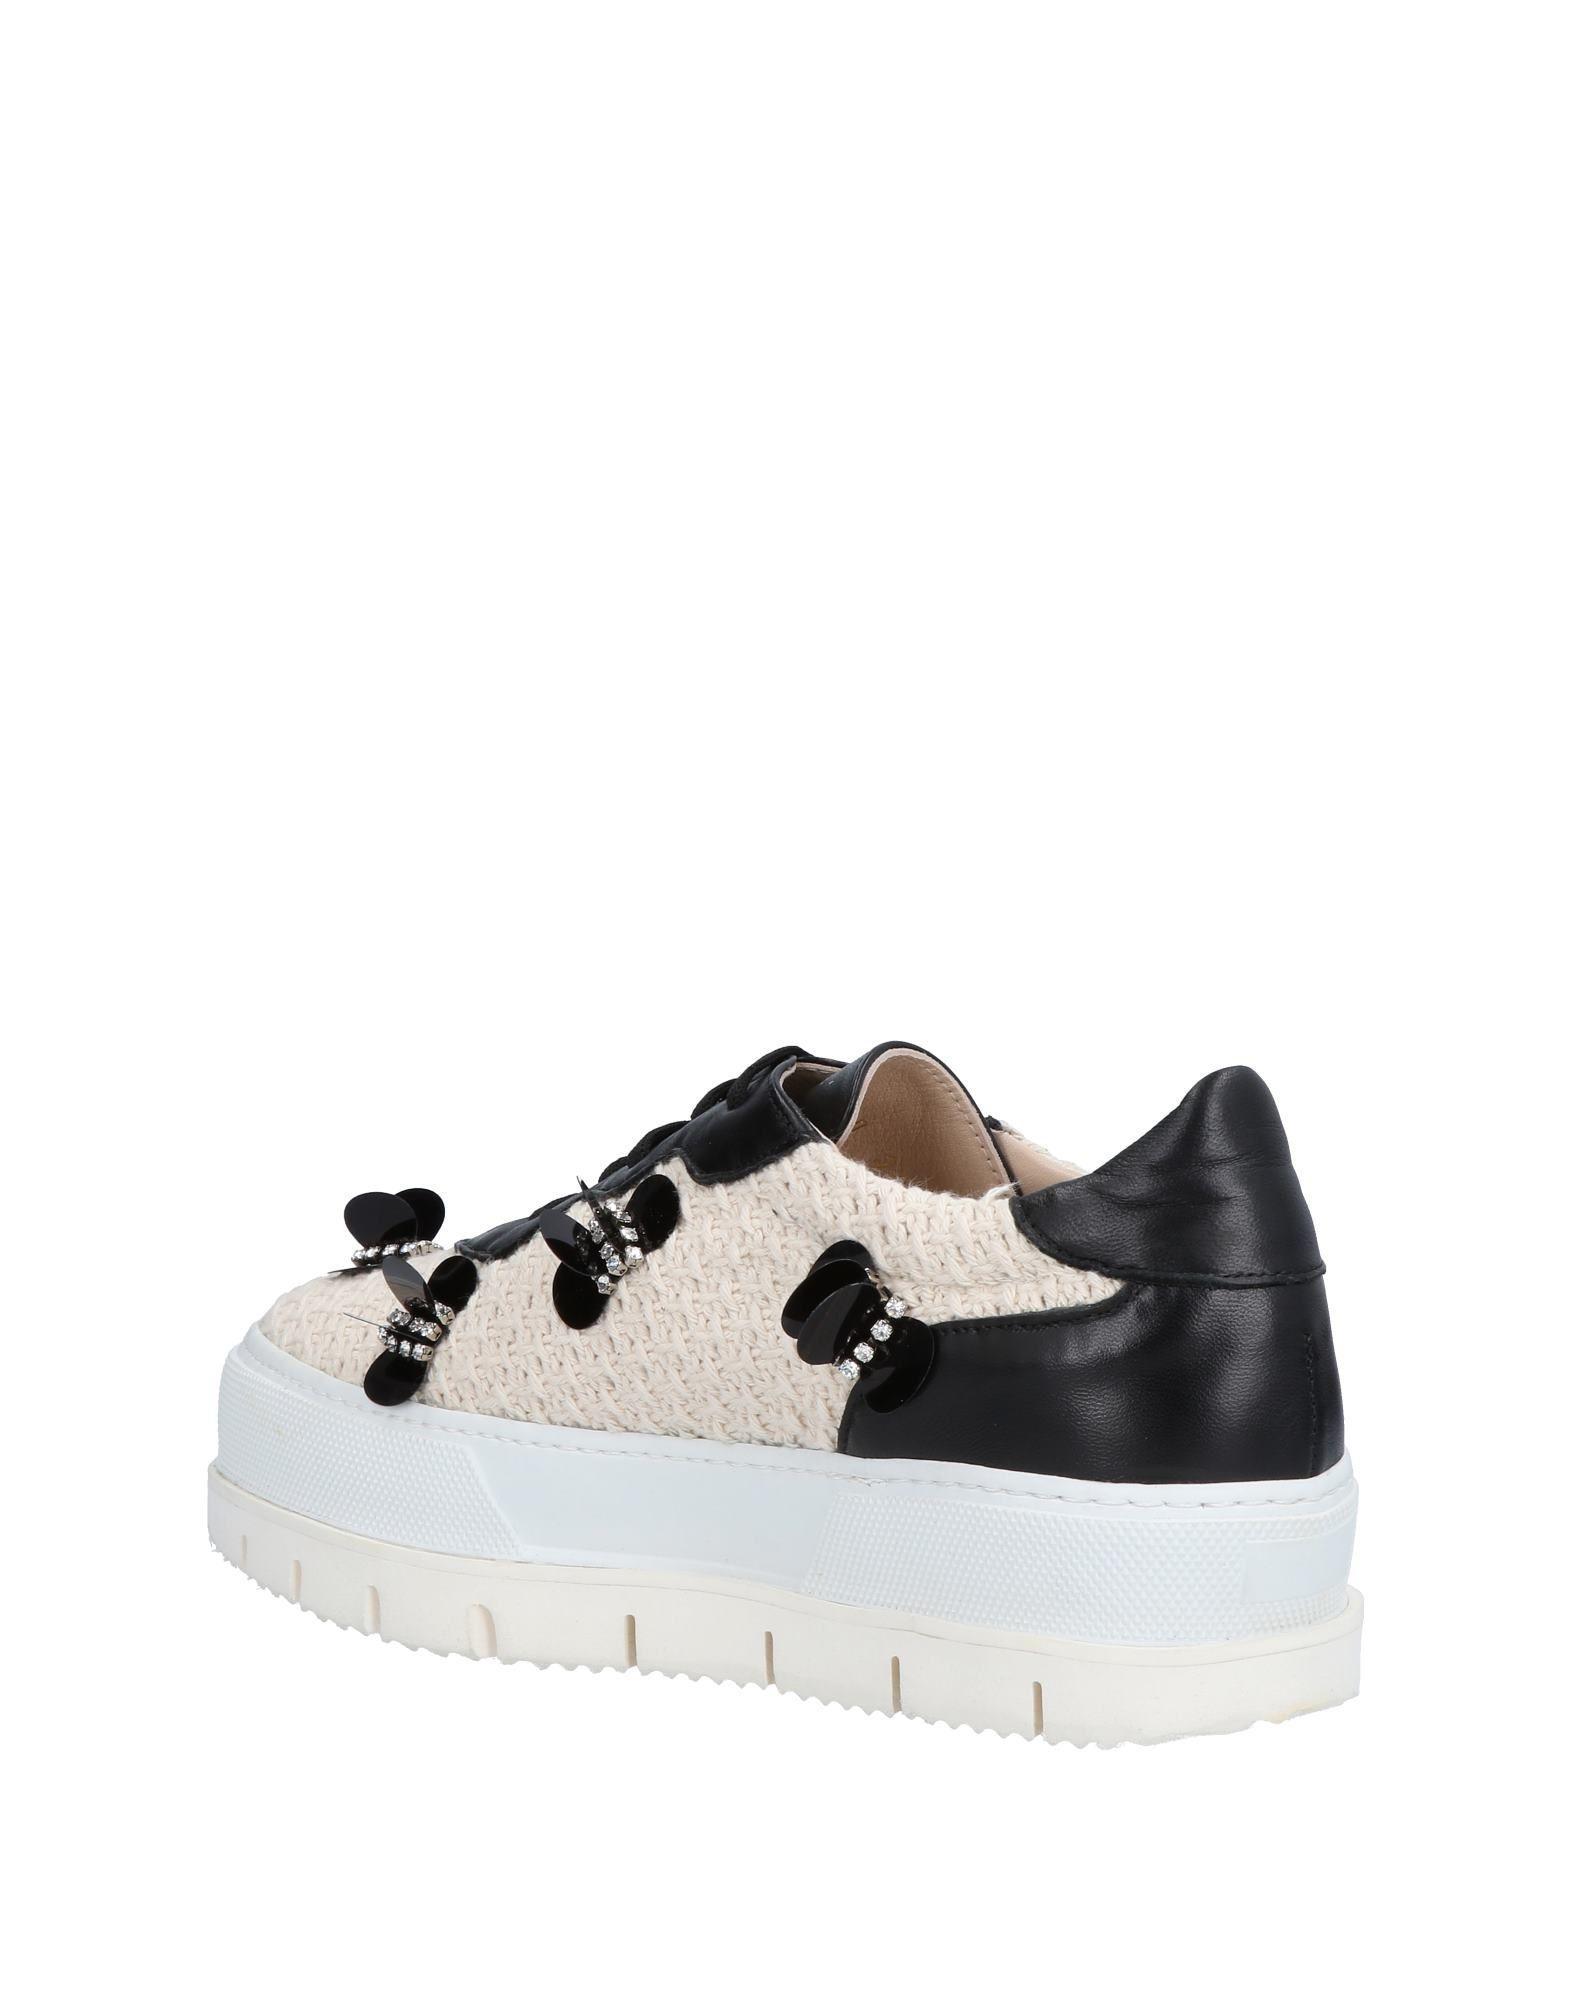 Giorgio Fabiani Tweed Low-tops & Sneakers in Ivory (White)